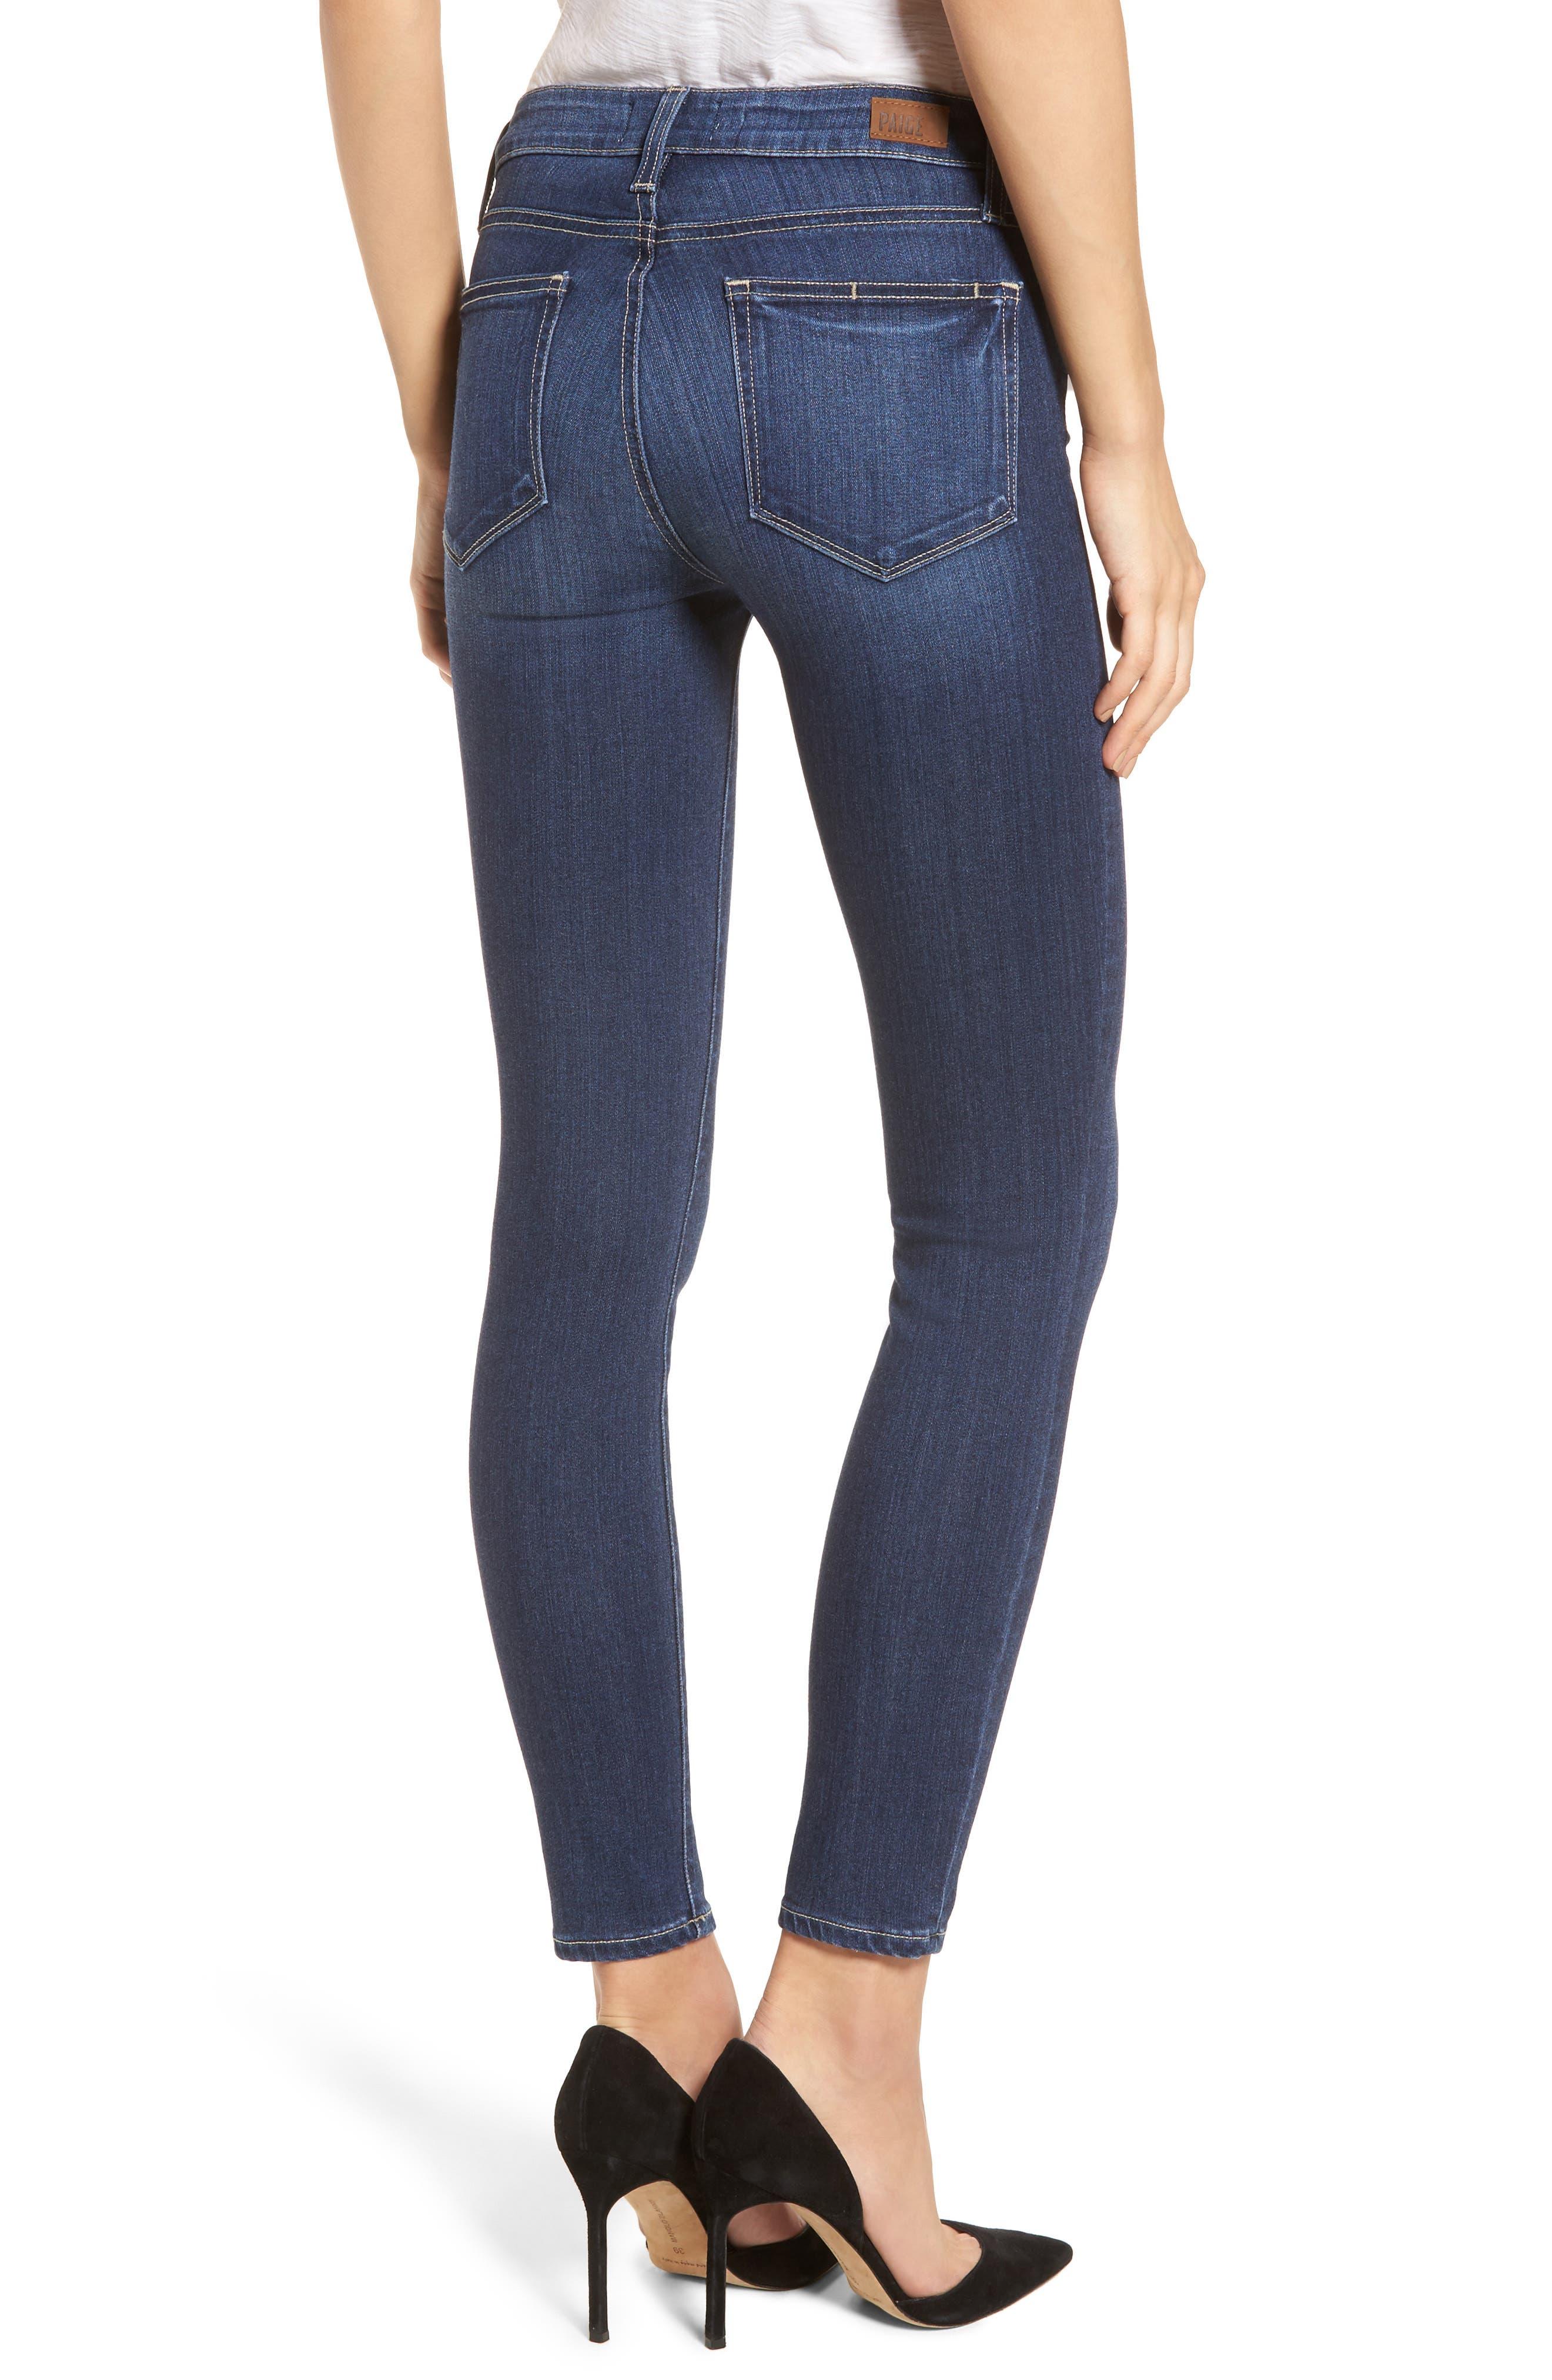 Transcend - Verdugo Ankle Skinny Jeans,                             Alternate thumbnail 2, color,                             Blue